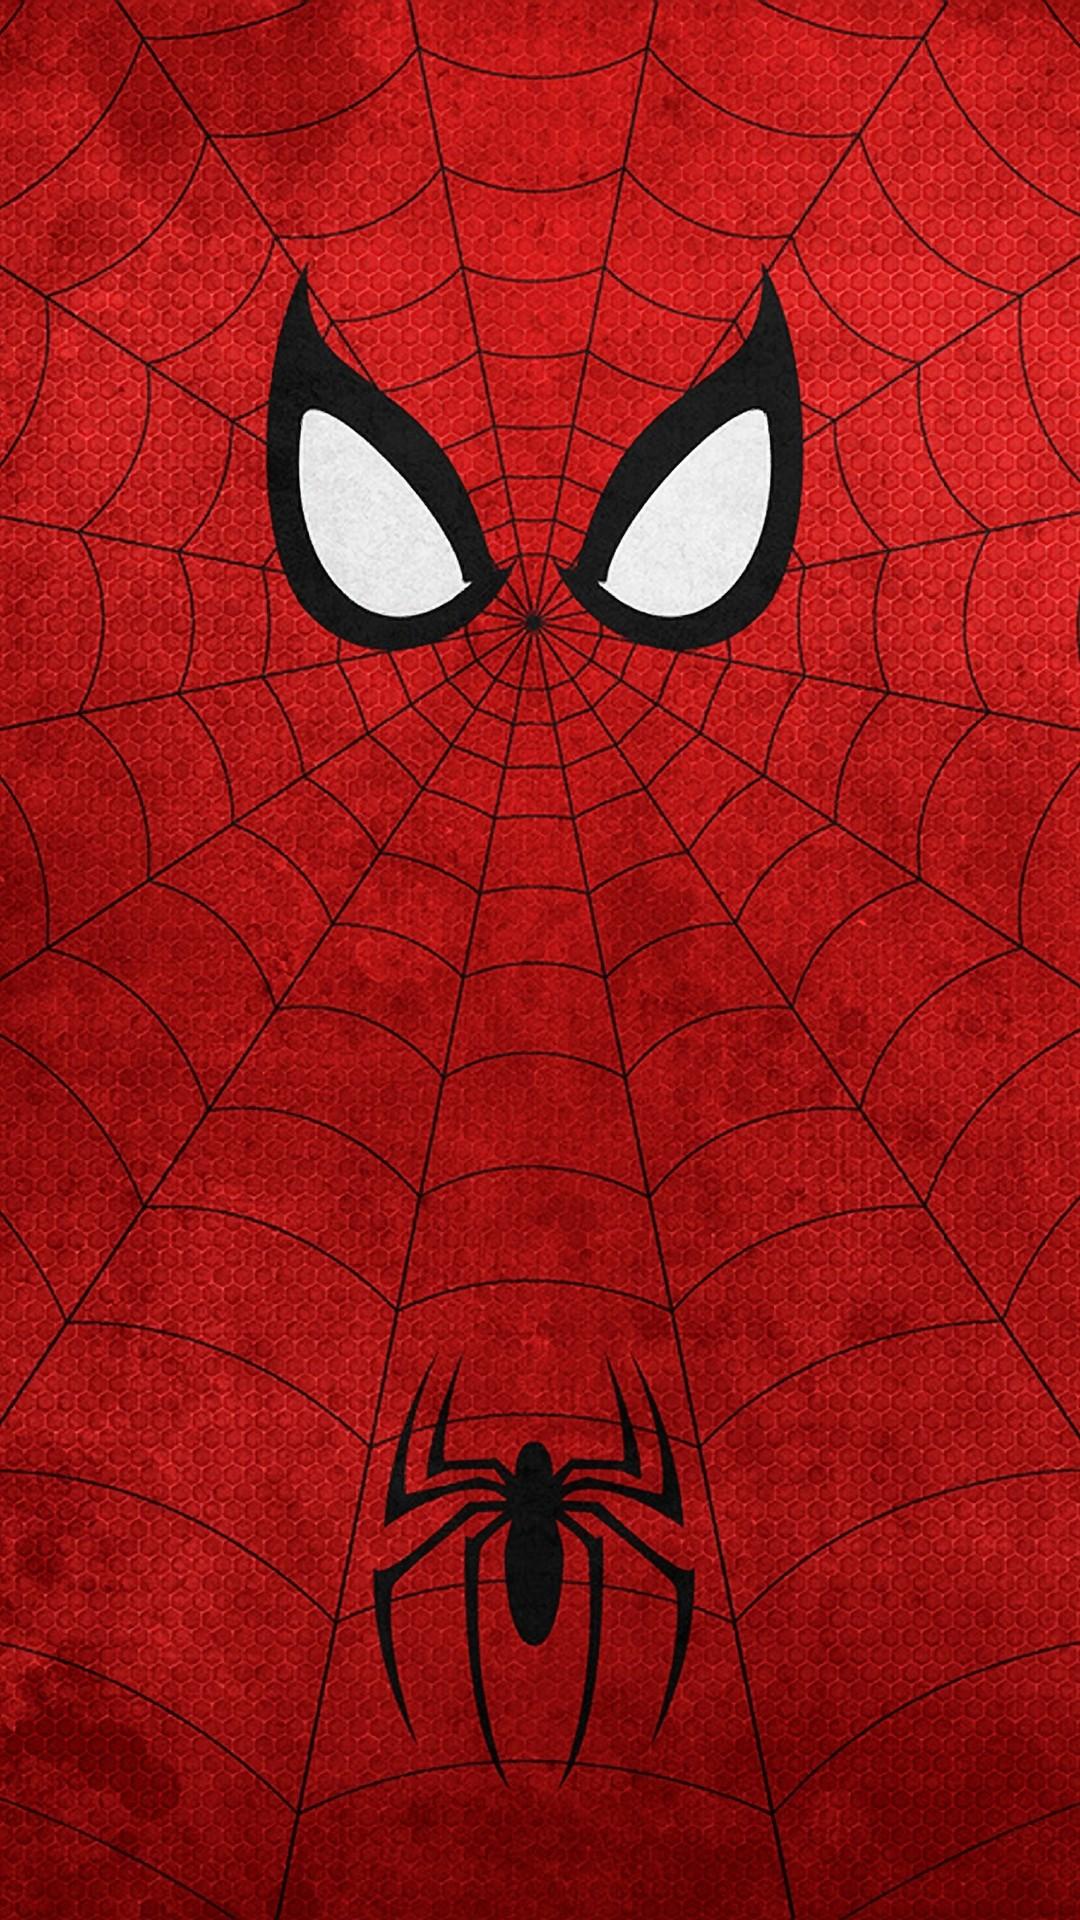 Spiderman iphone home screen Spiderman iphone screen